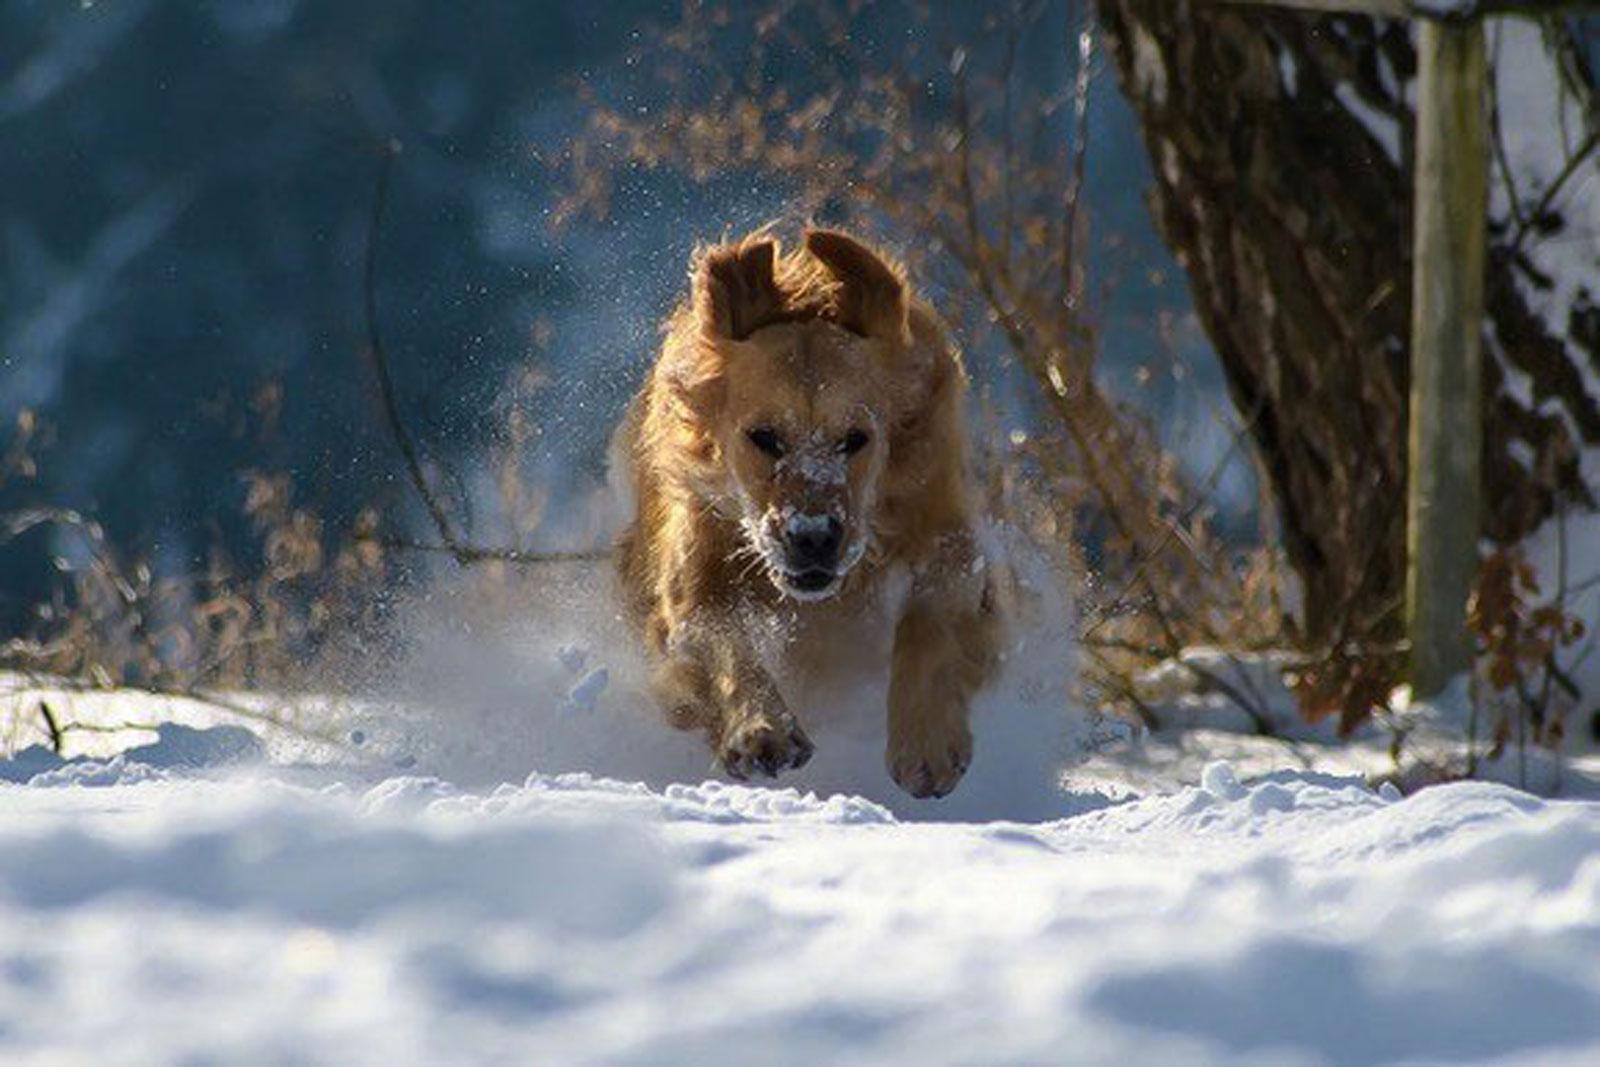 Hunde spielen gerne im Schnee – Napf Express Onlineshop Hundefutter & Katzenfutter • Tipps für Hunde • Hundefutter online kaufen Barf-Shop